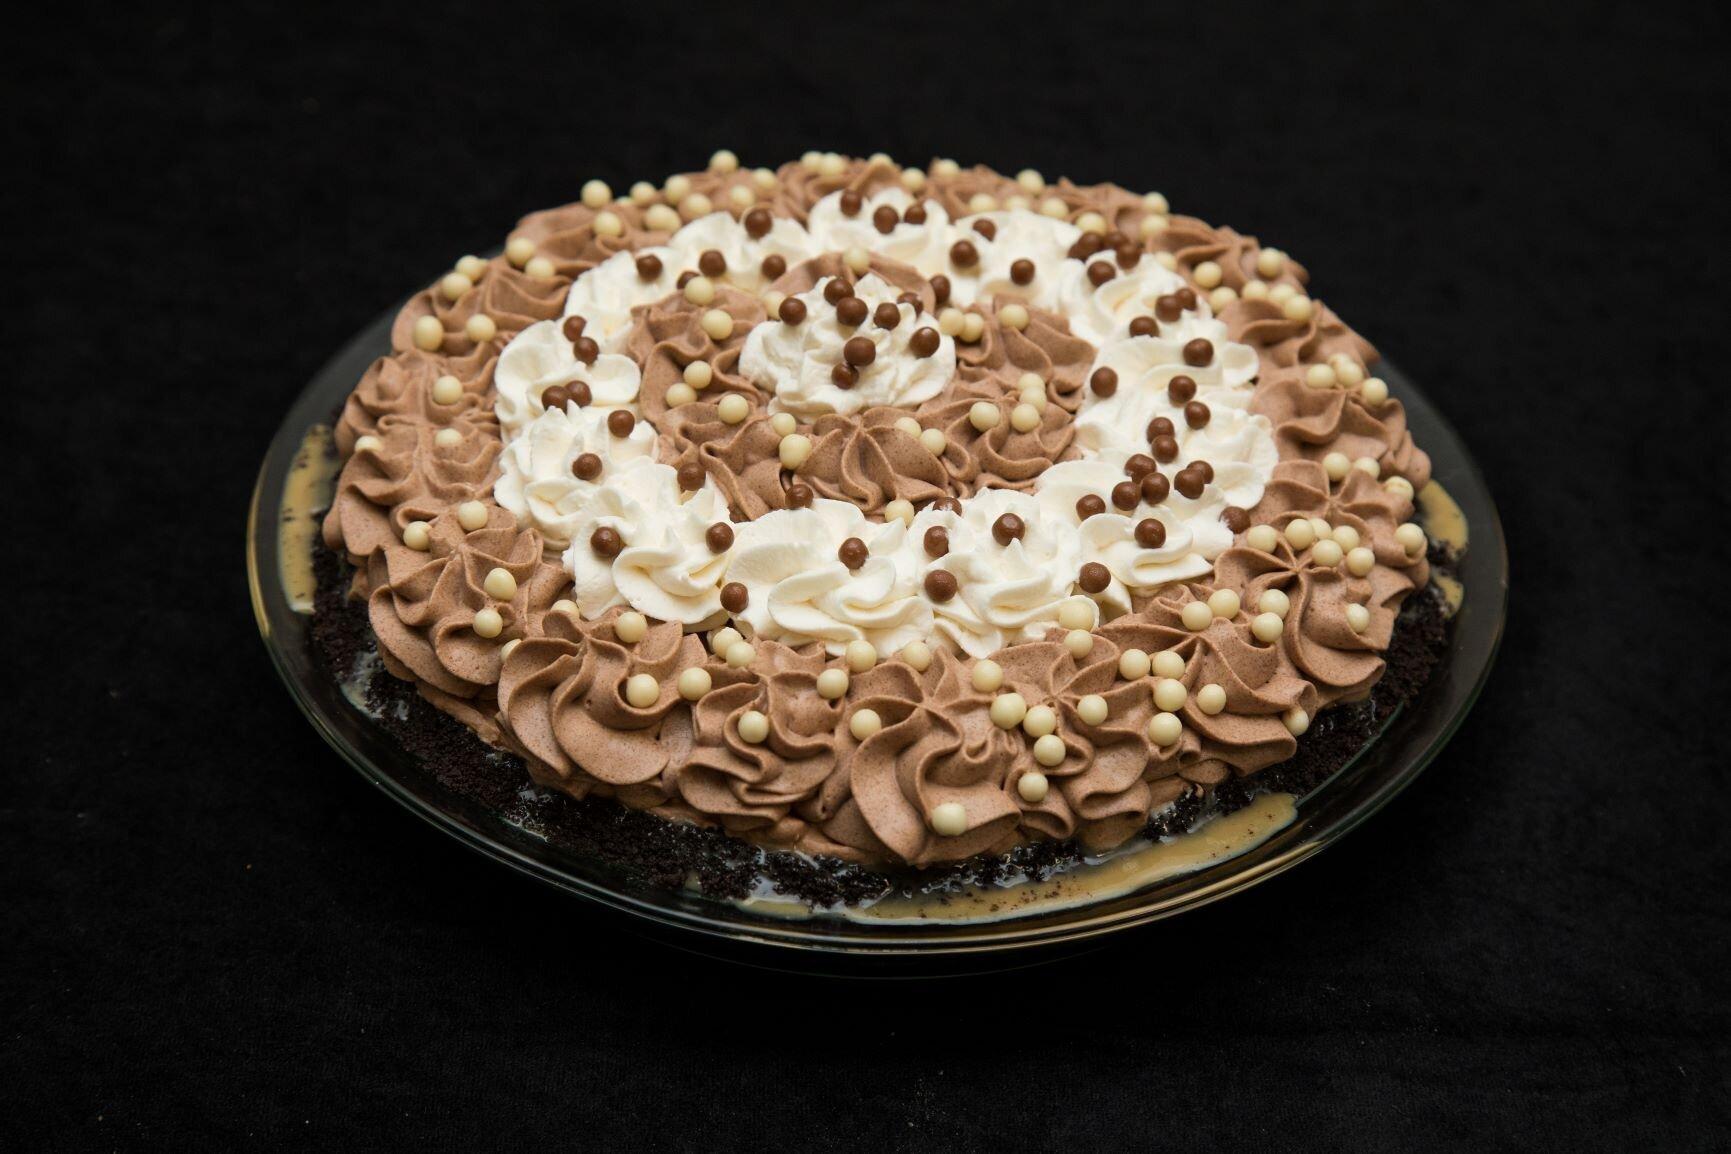 This is Rhonda Hull's top-prize-winning Denali Caribou Crunch Pie.